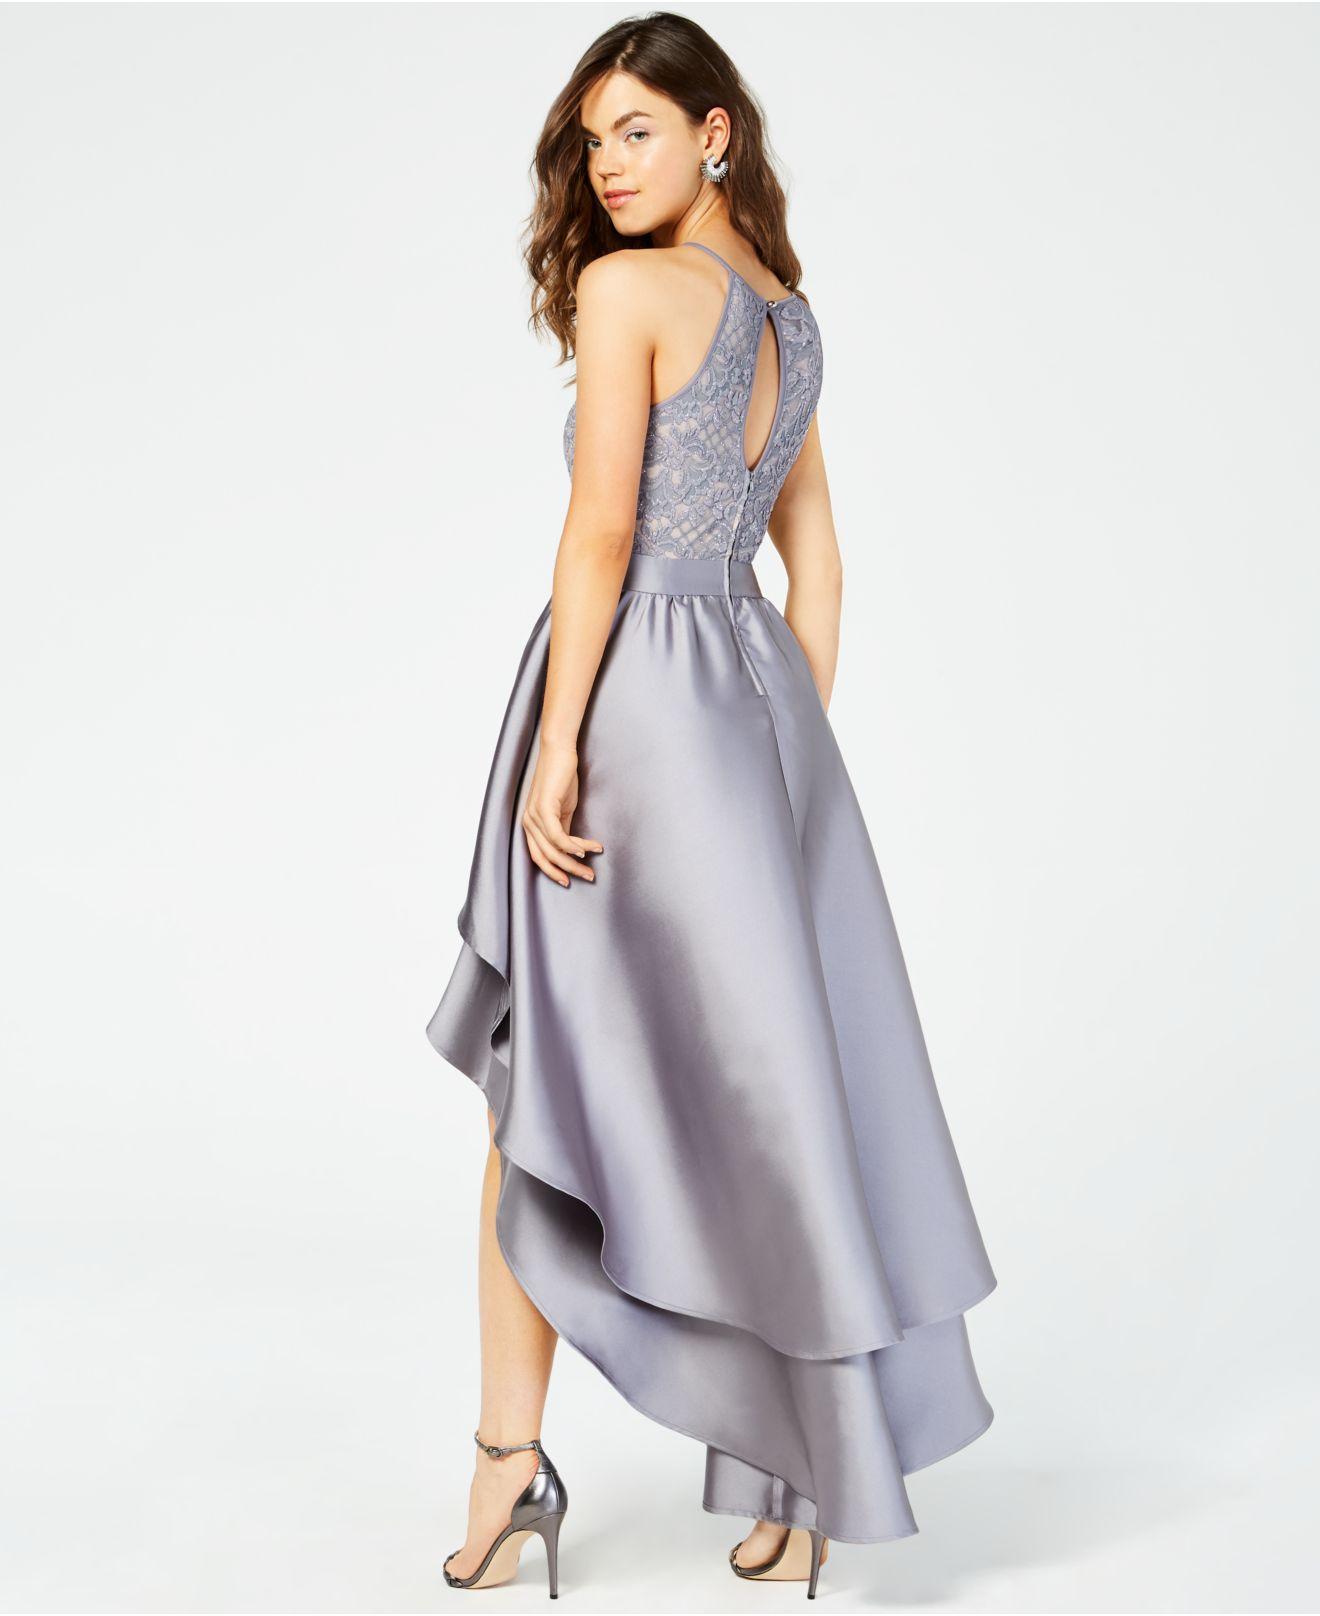 Macys Formal Dresses Long Sleeve Carley Connellan